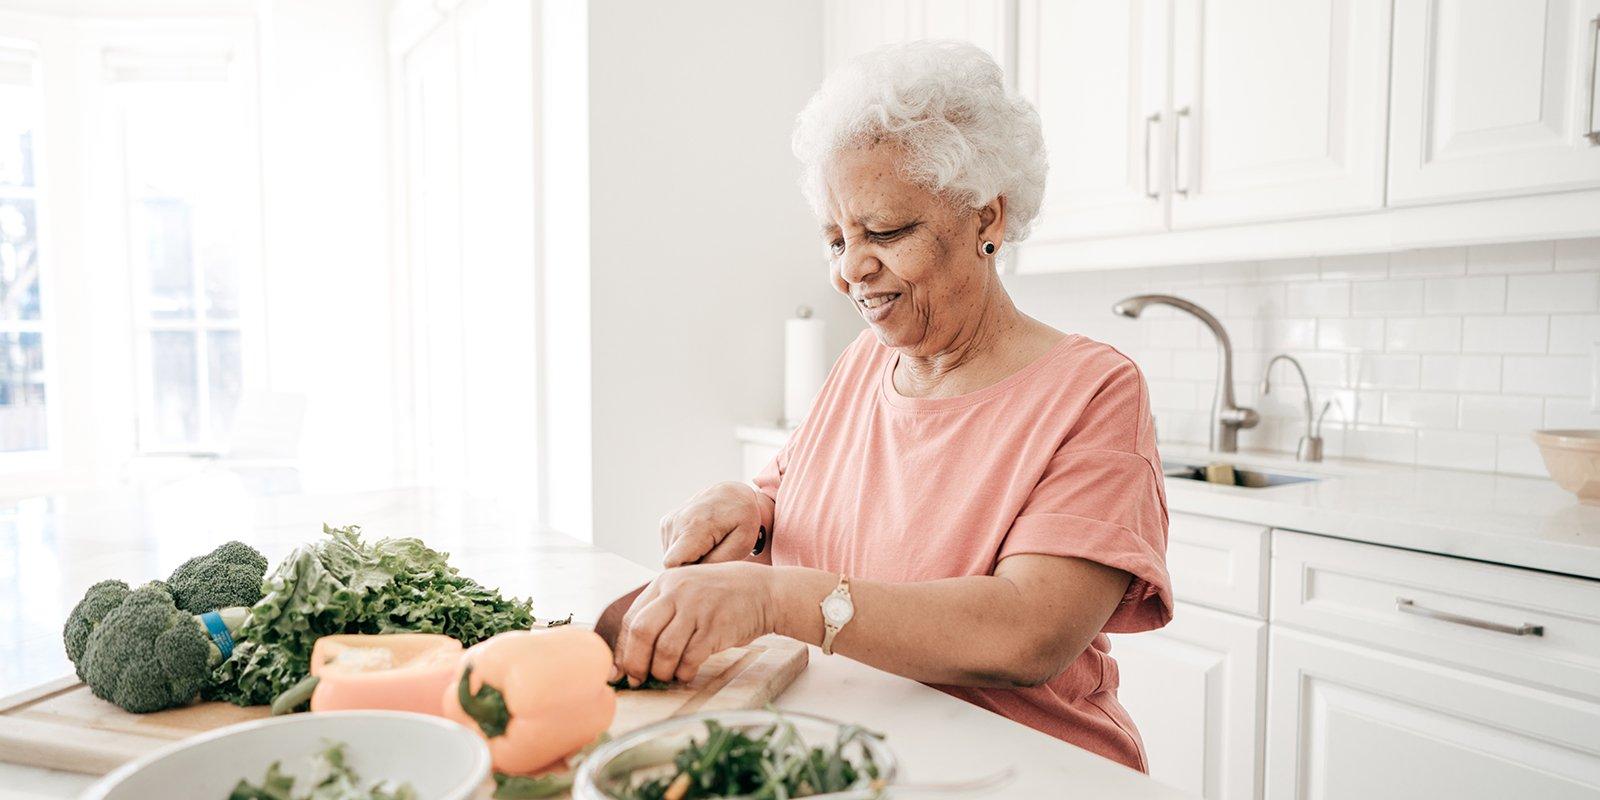 elderly woman chopping vegetables in kitchen